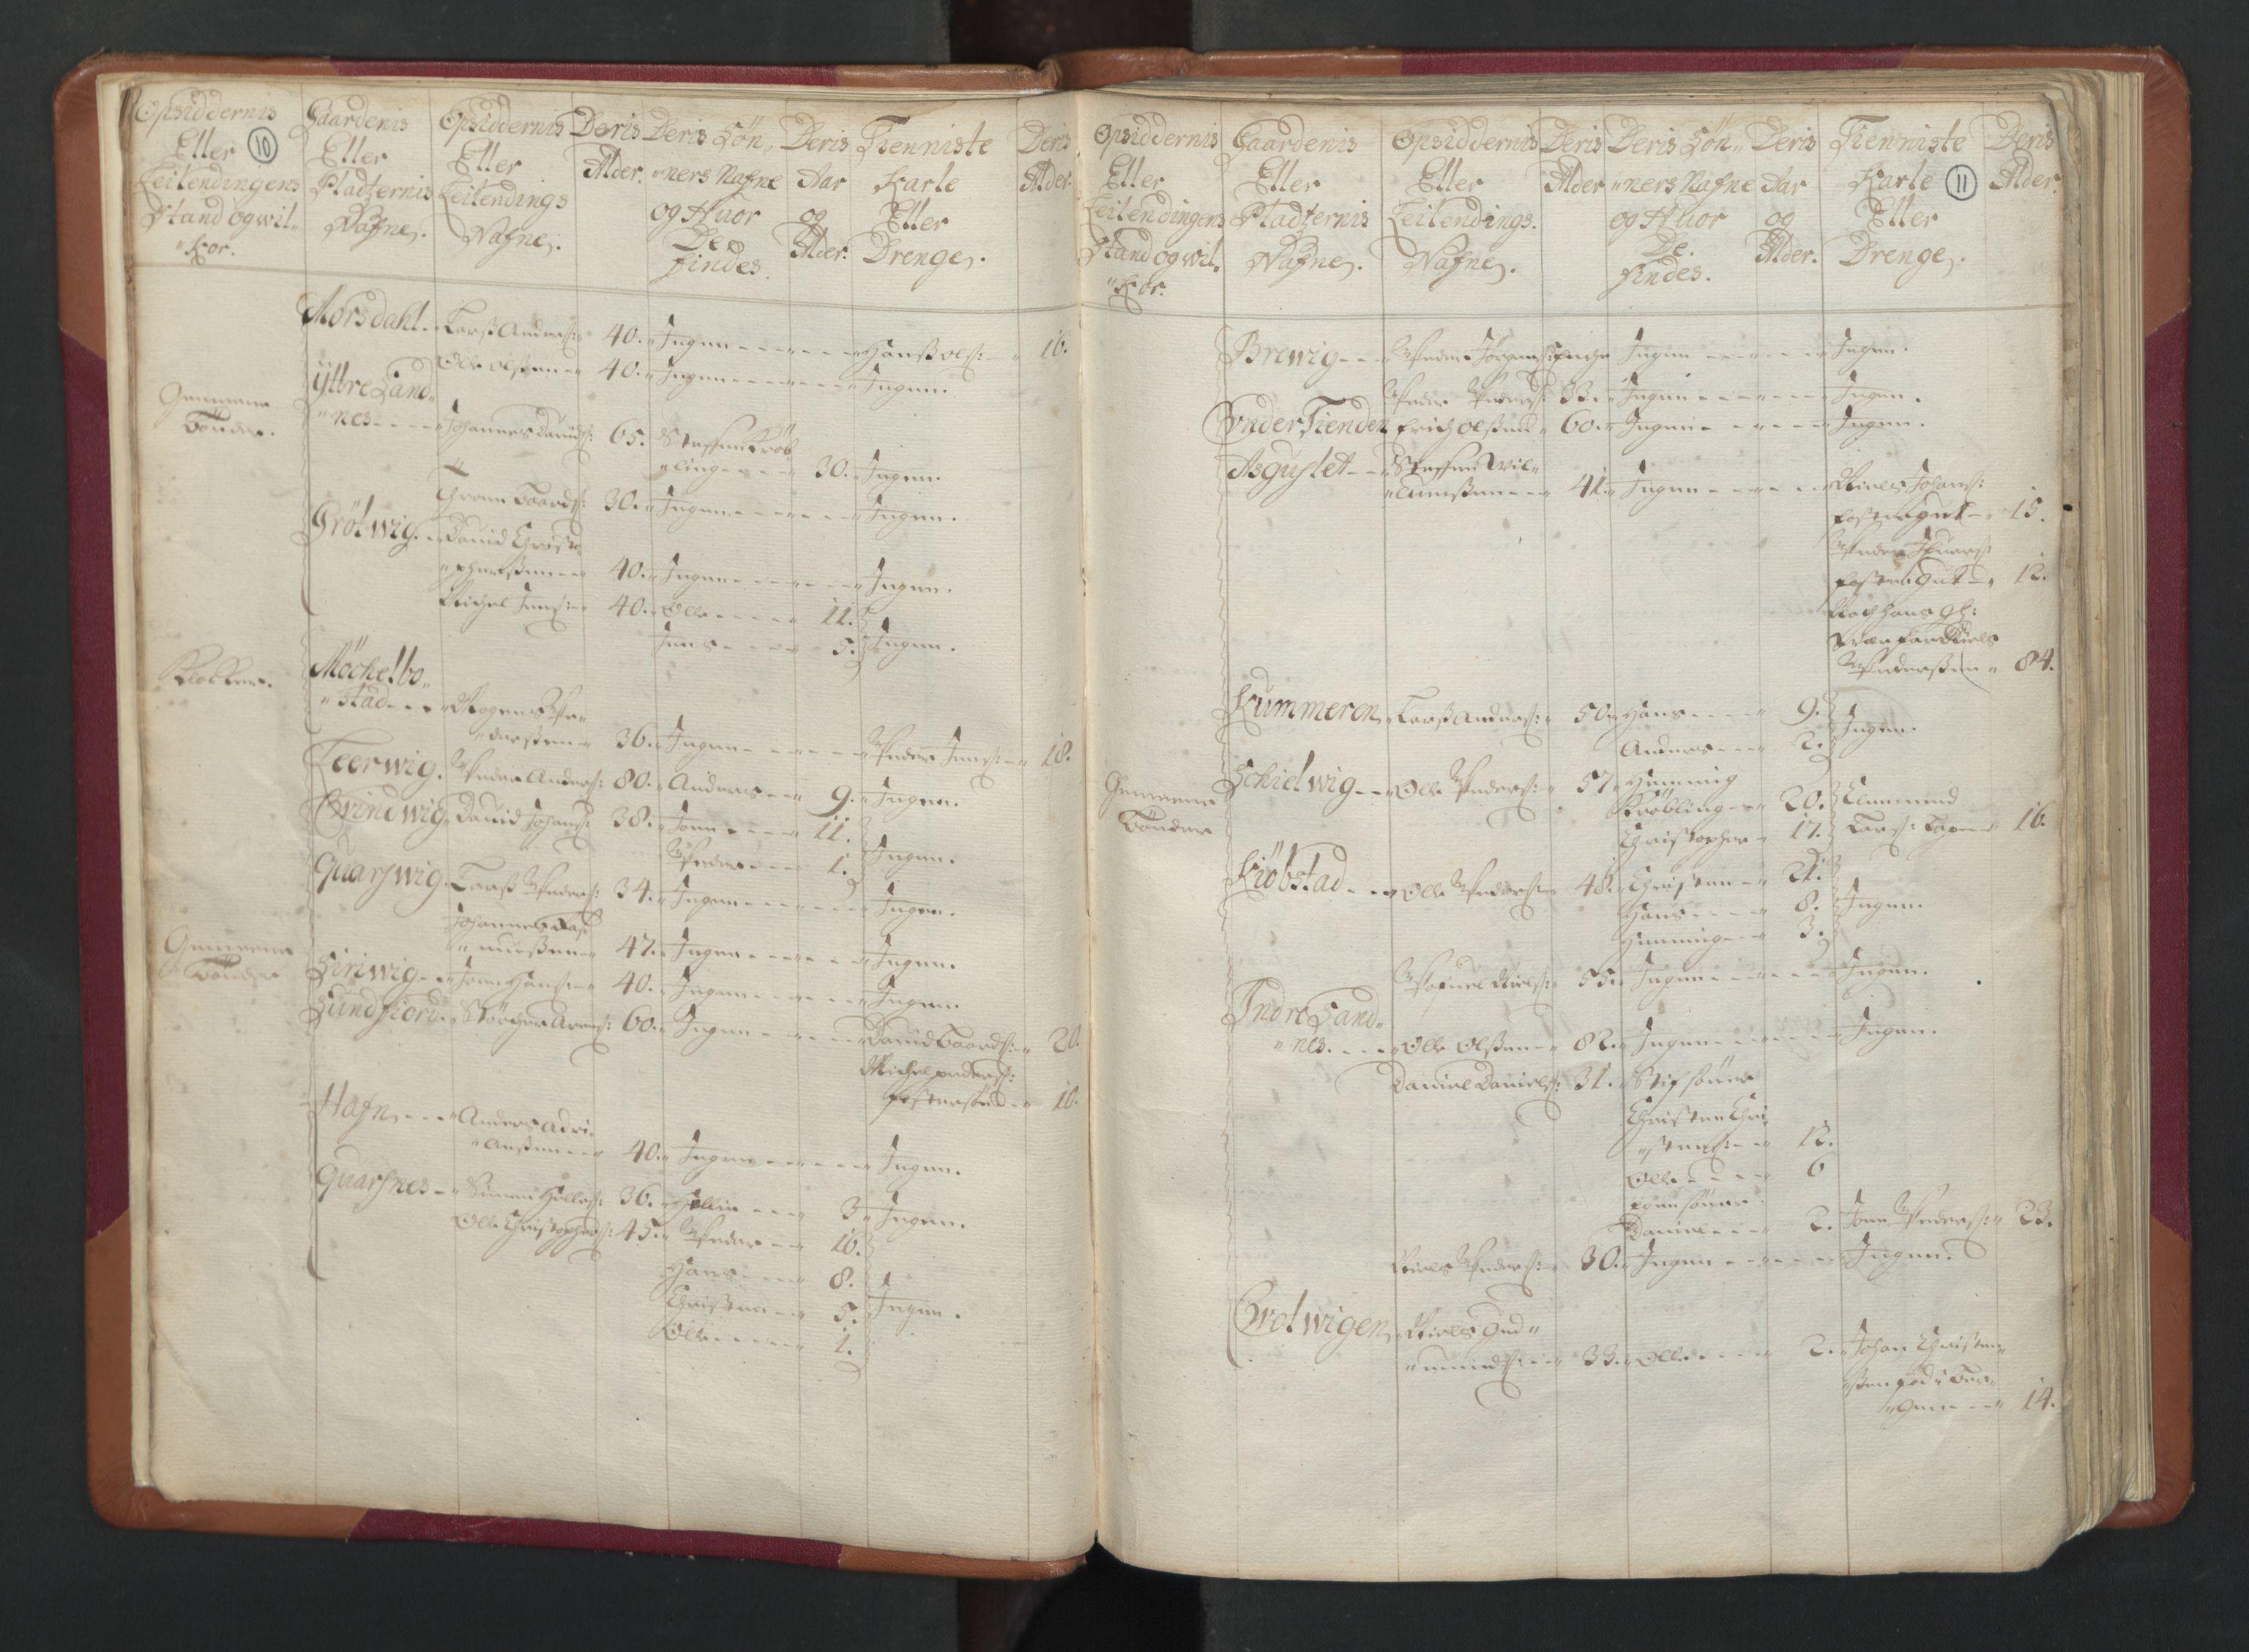 RA, Manntallet 1701, nr. 17: Salten fogderi, 1701, s. 10-11